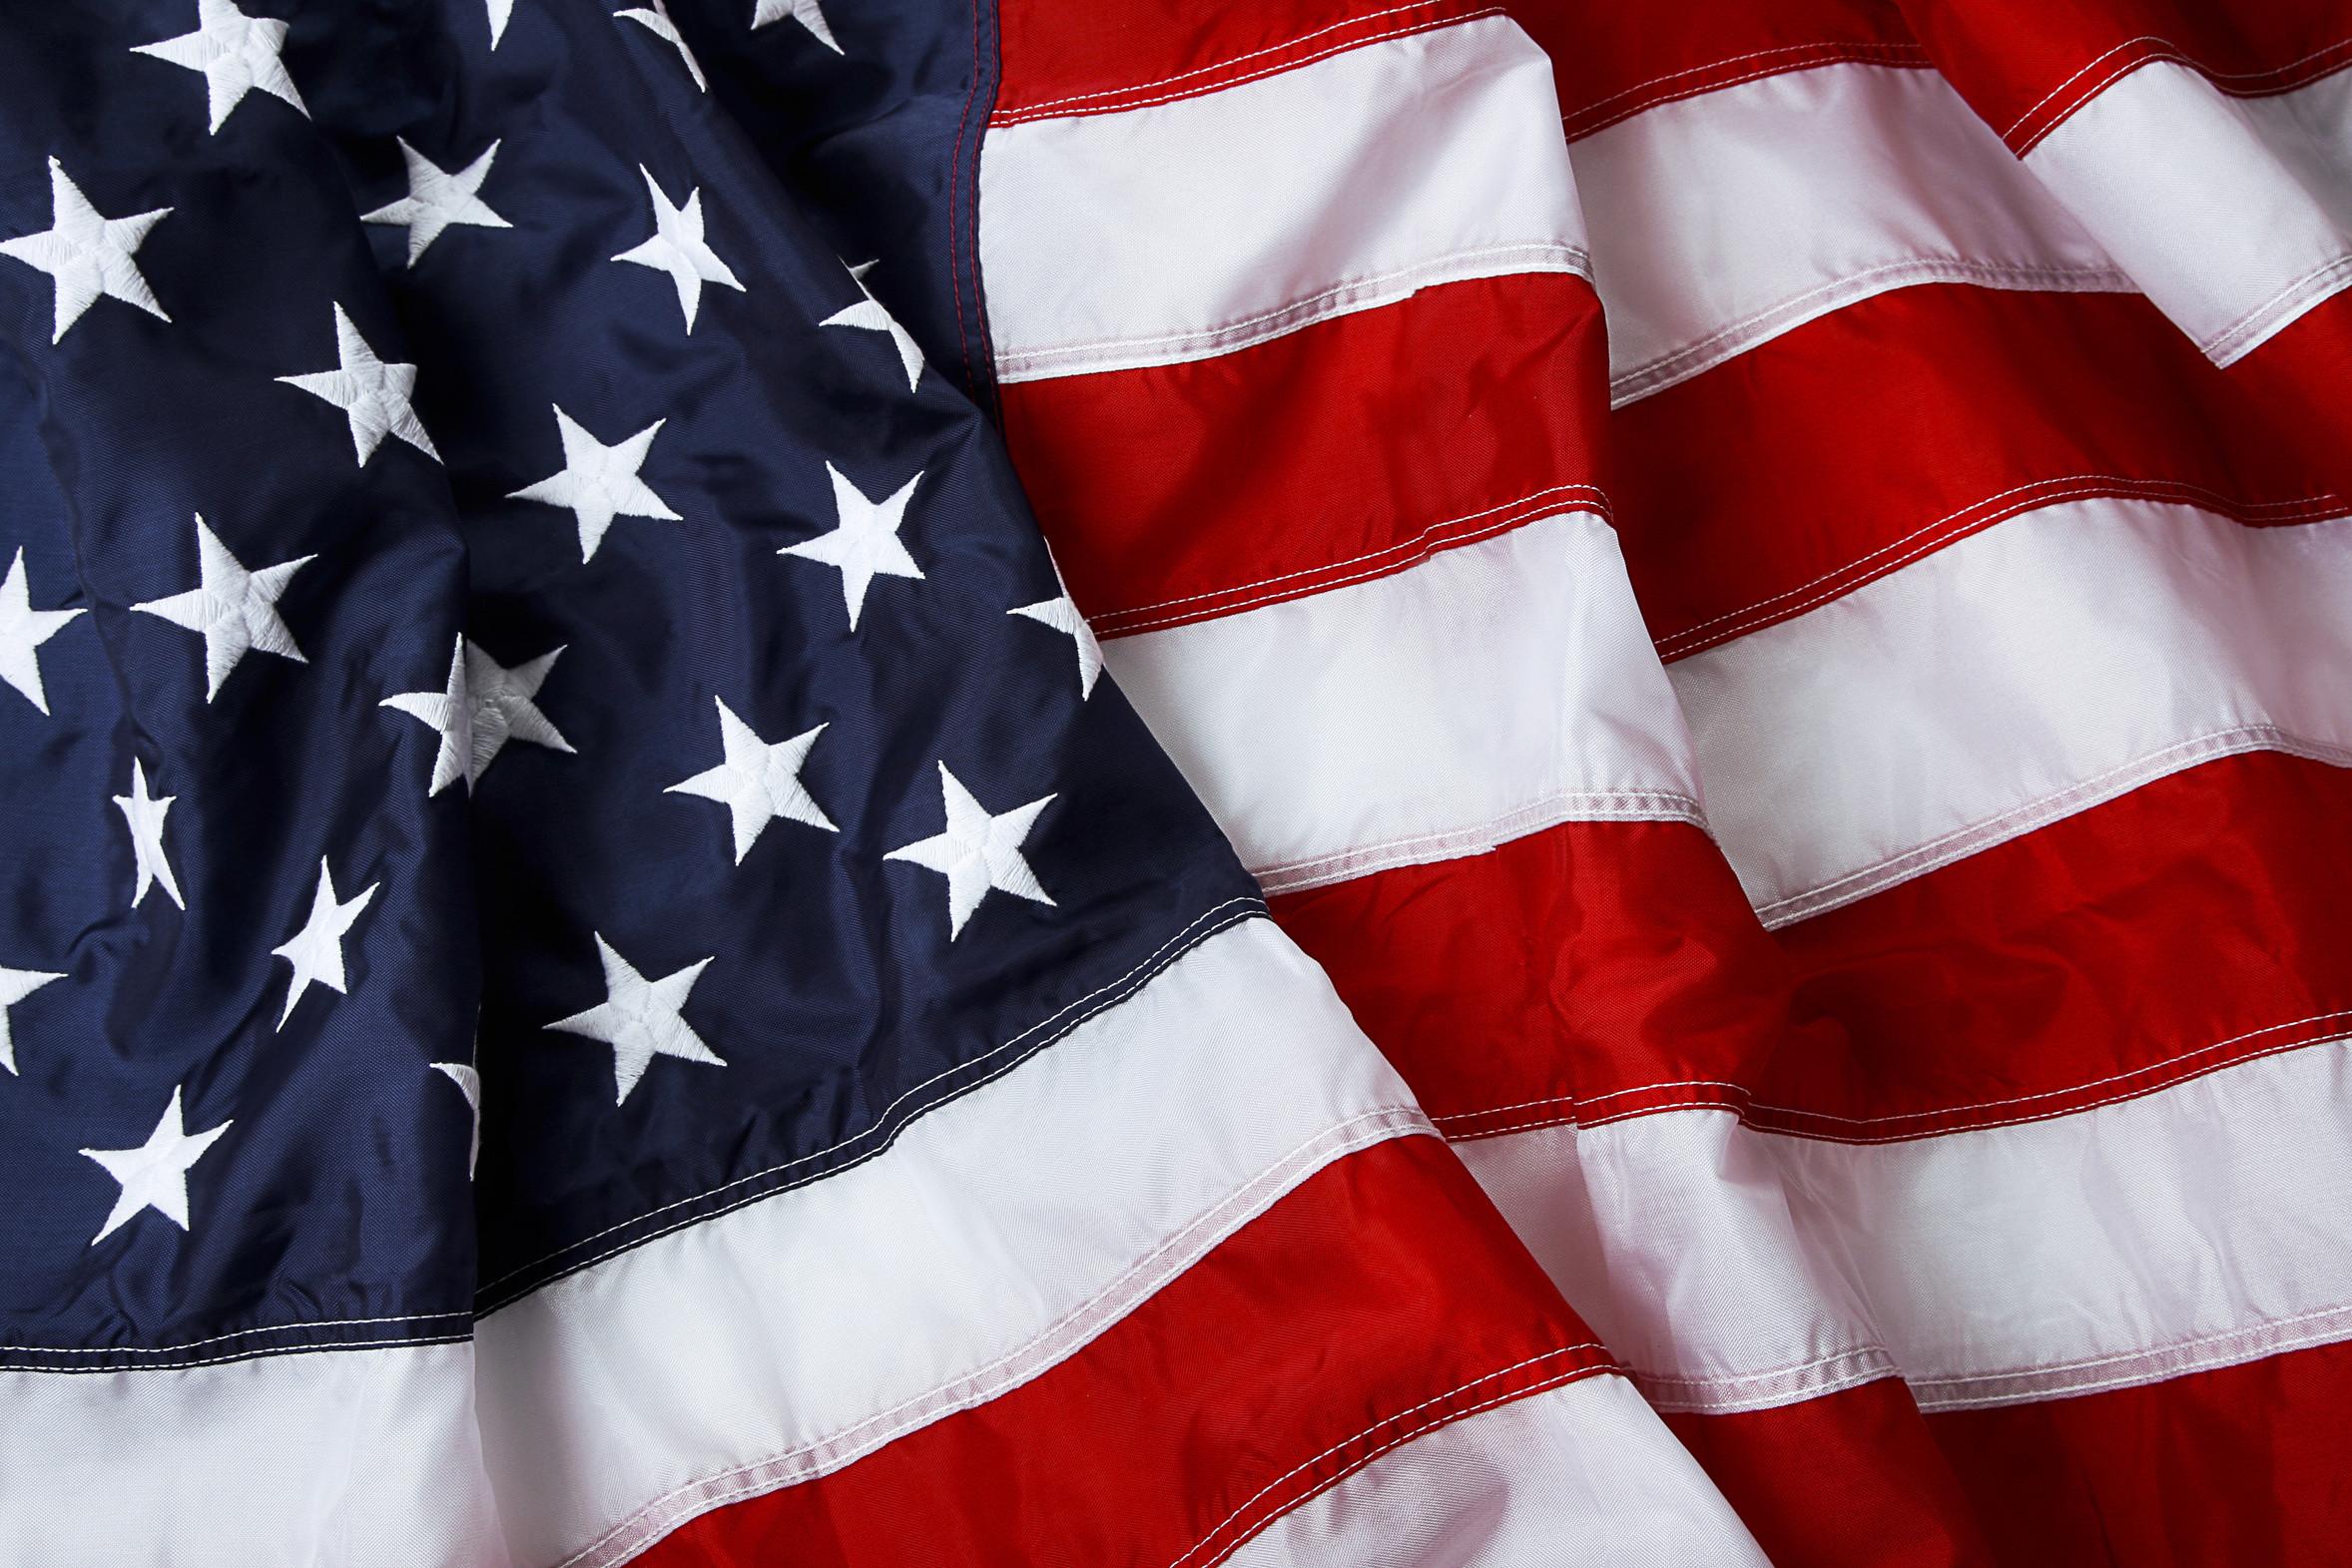 1920x1201 American Flag Free Desktop Wallpaper Newt Kingsman 2016 12 06